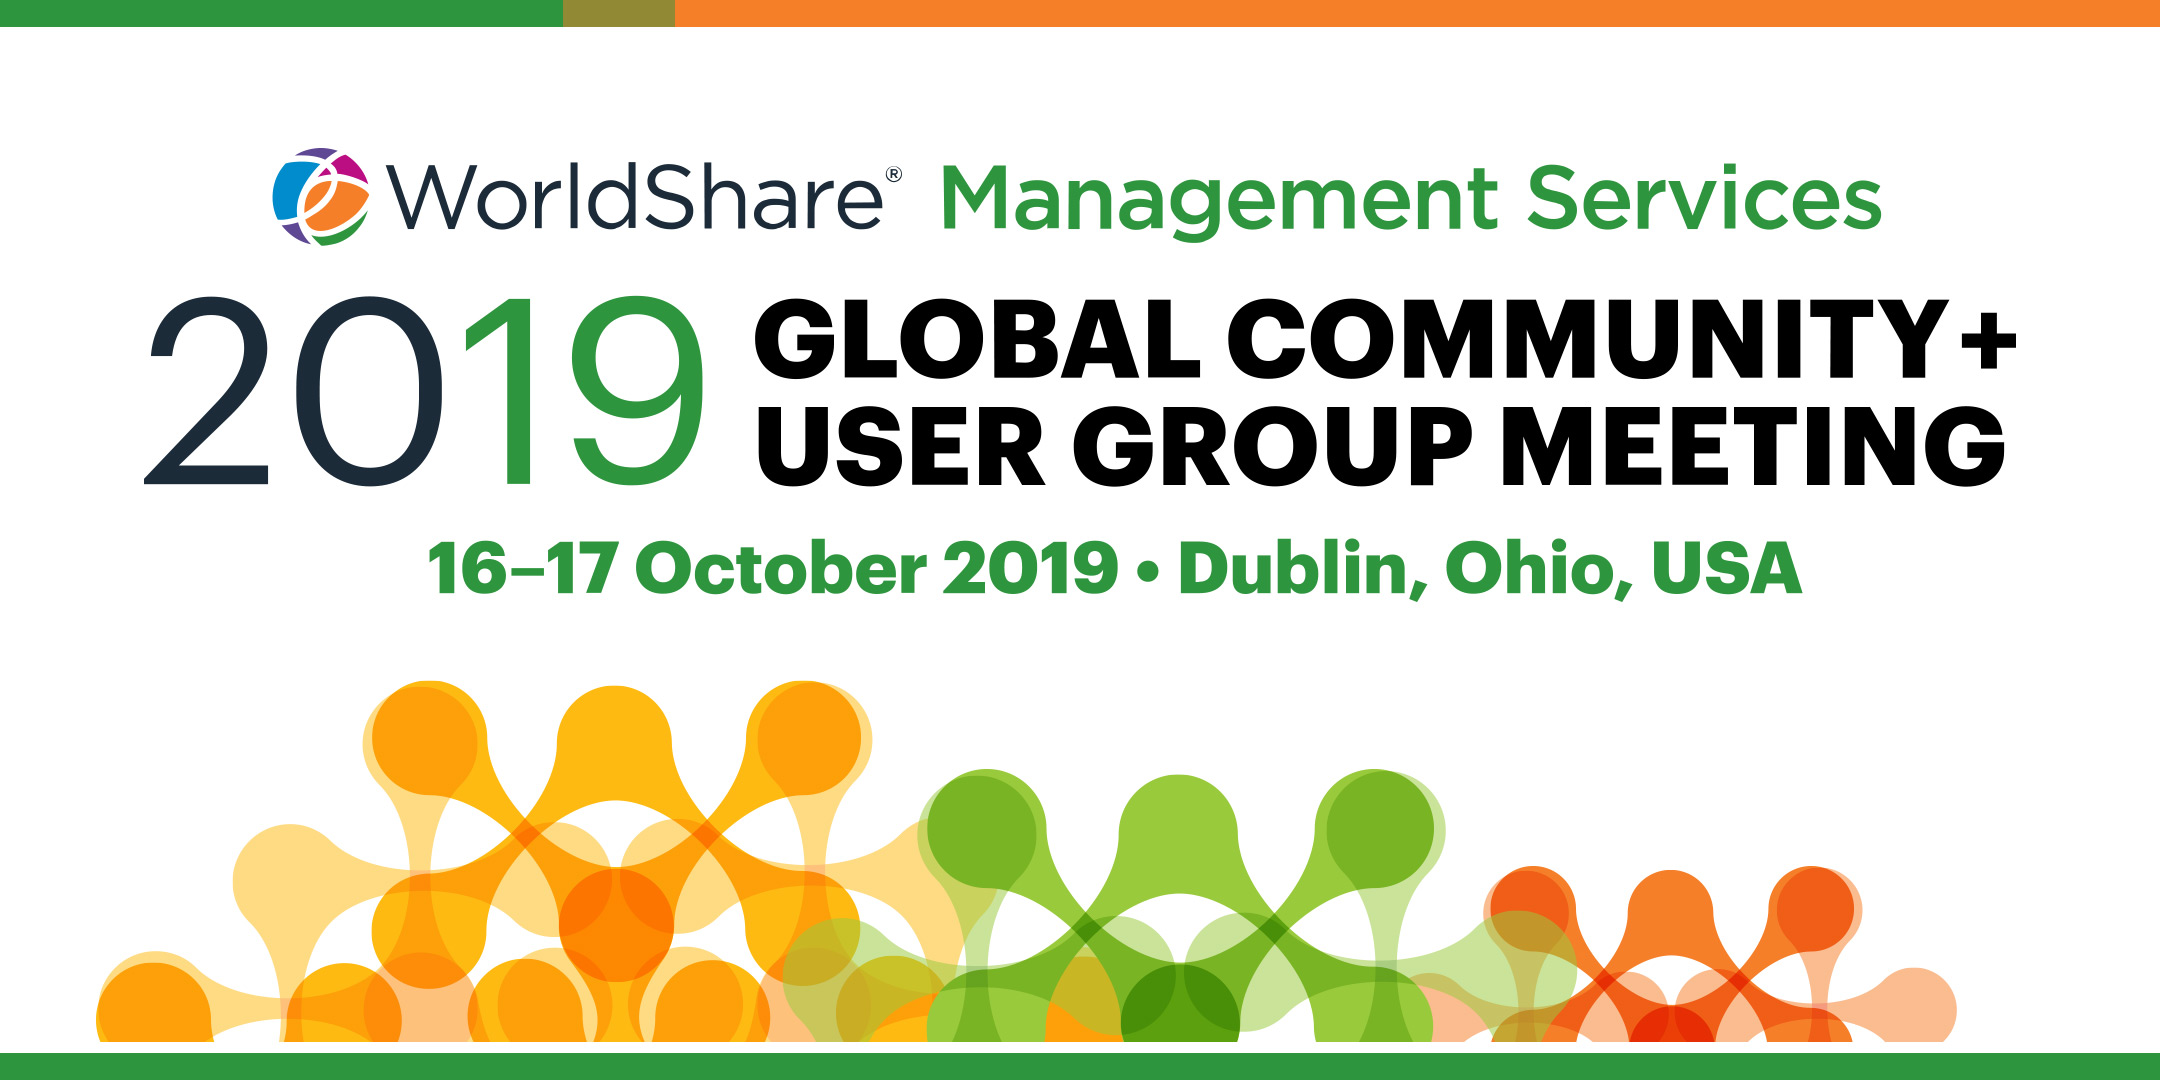 OCLC 2019 WMS Global Community + User Group Meeting